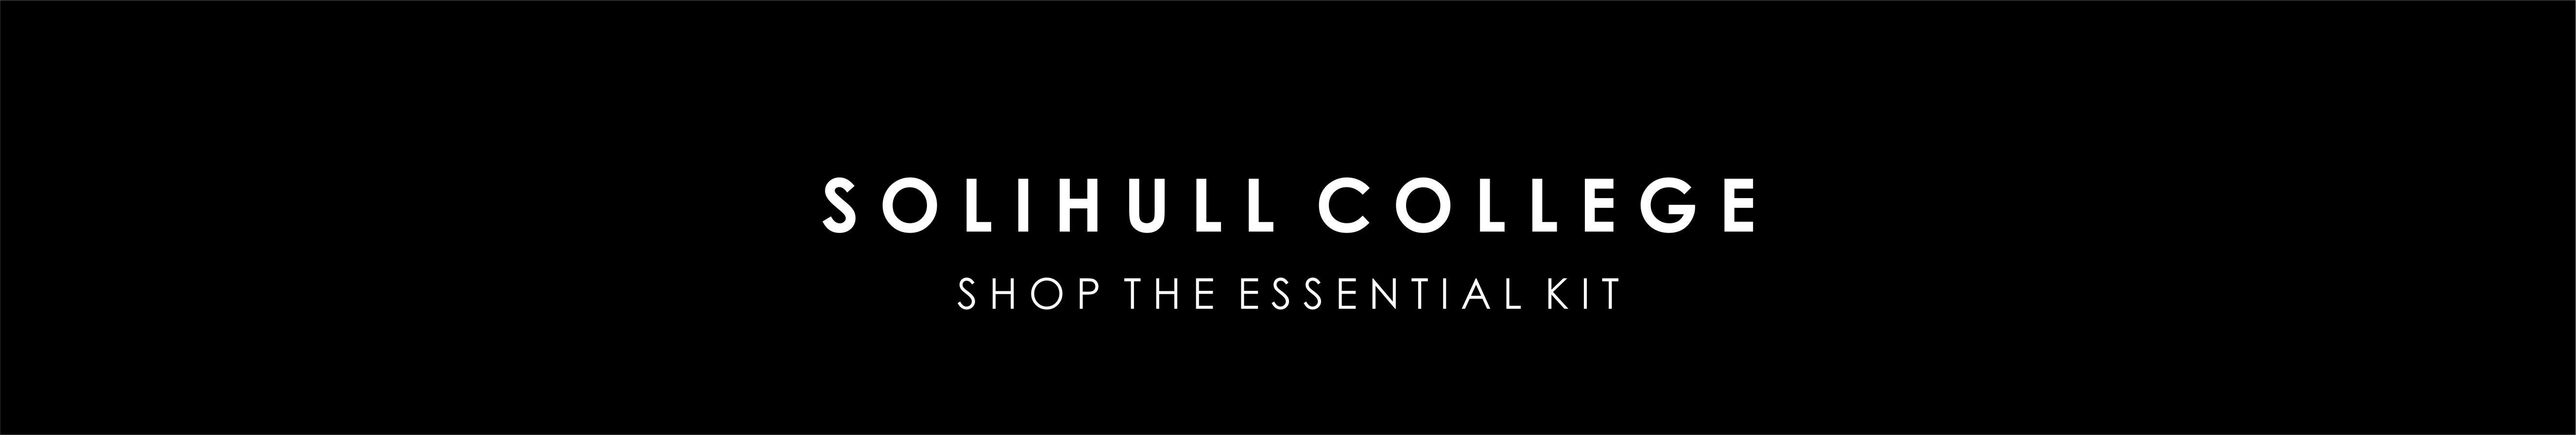 solihull-college-banner-uniformed-essential.jpg